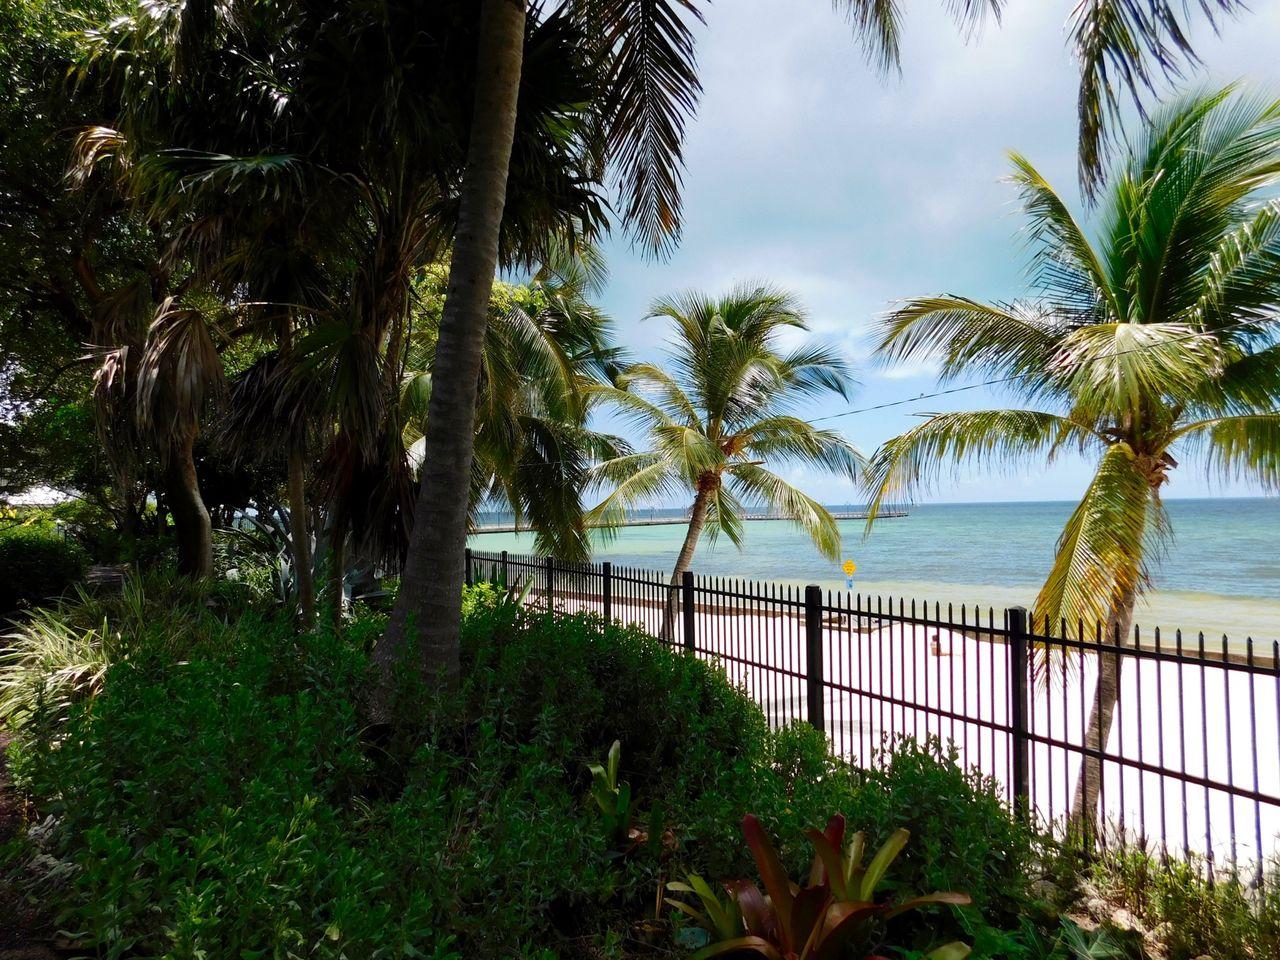 West Martello Tower Fort Jardin Key West 4744 Le